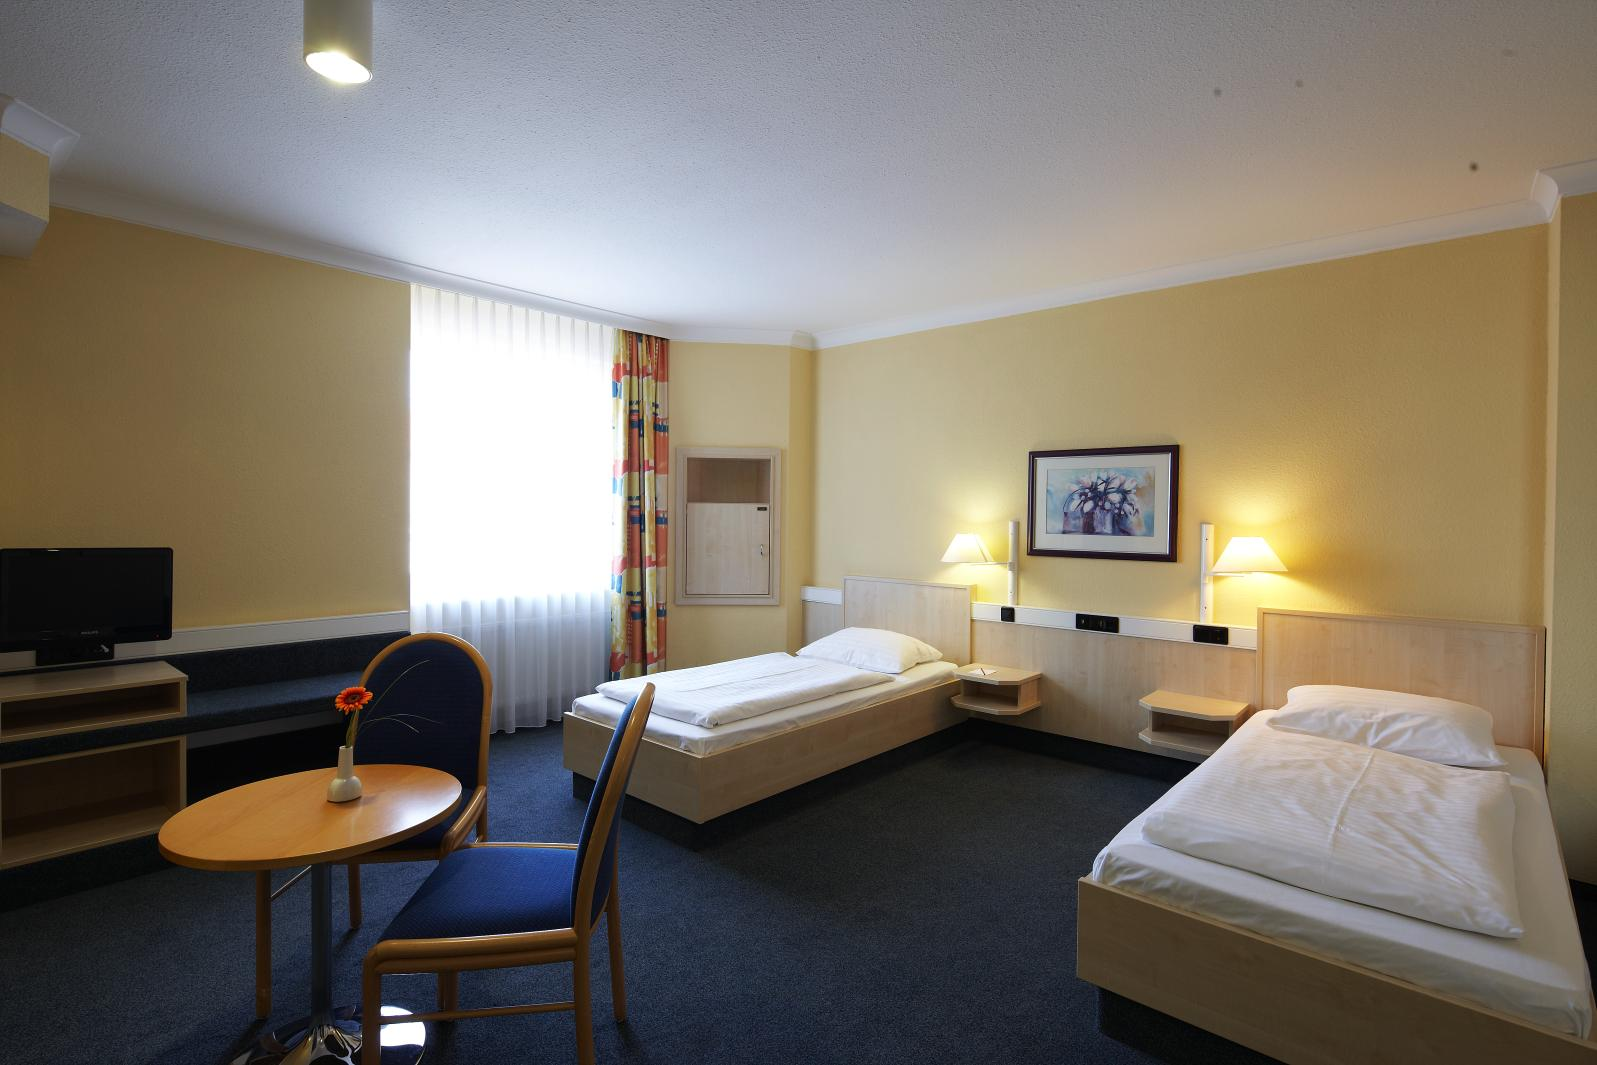 44555_ICH_Erfurt_rooms_HDD_behindertengerecht_1